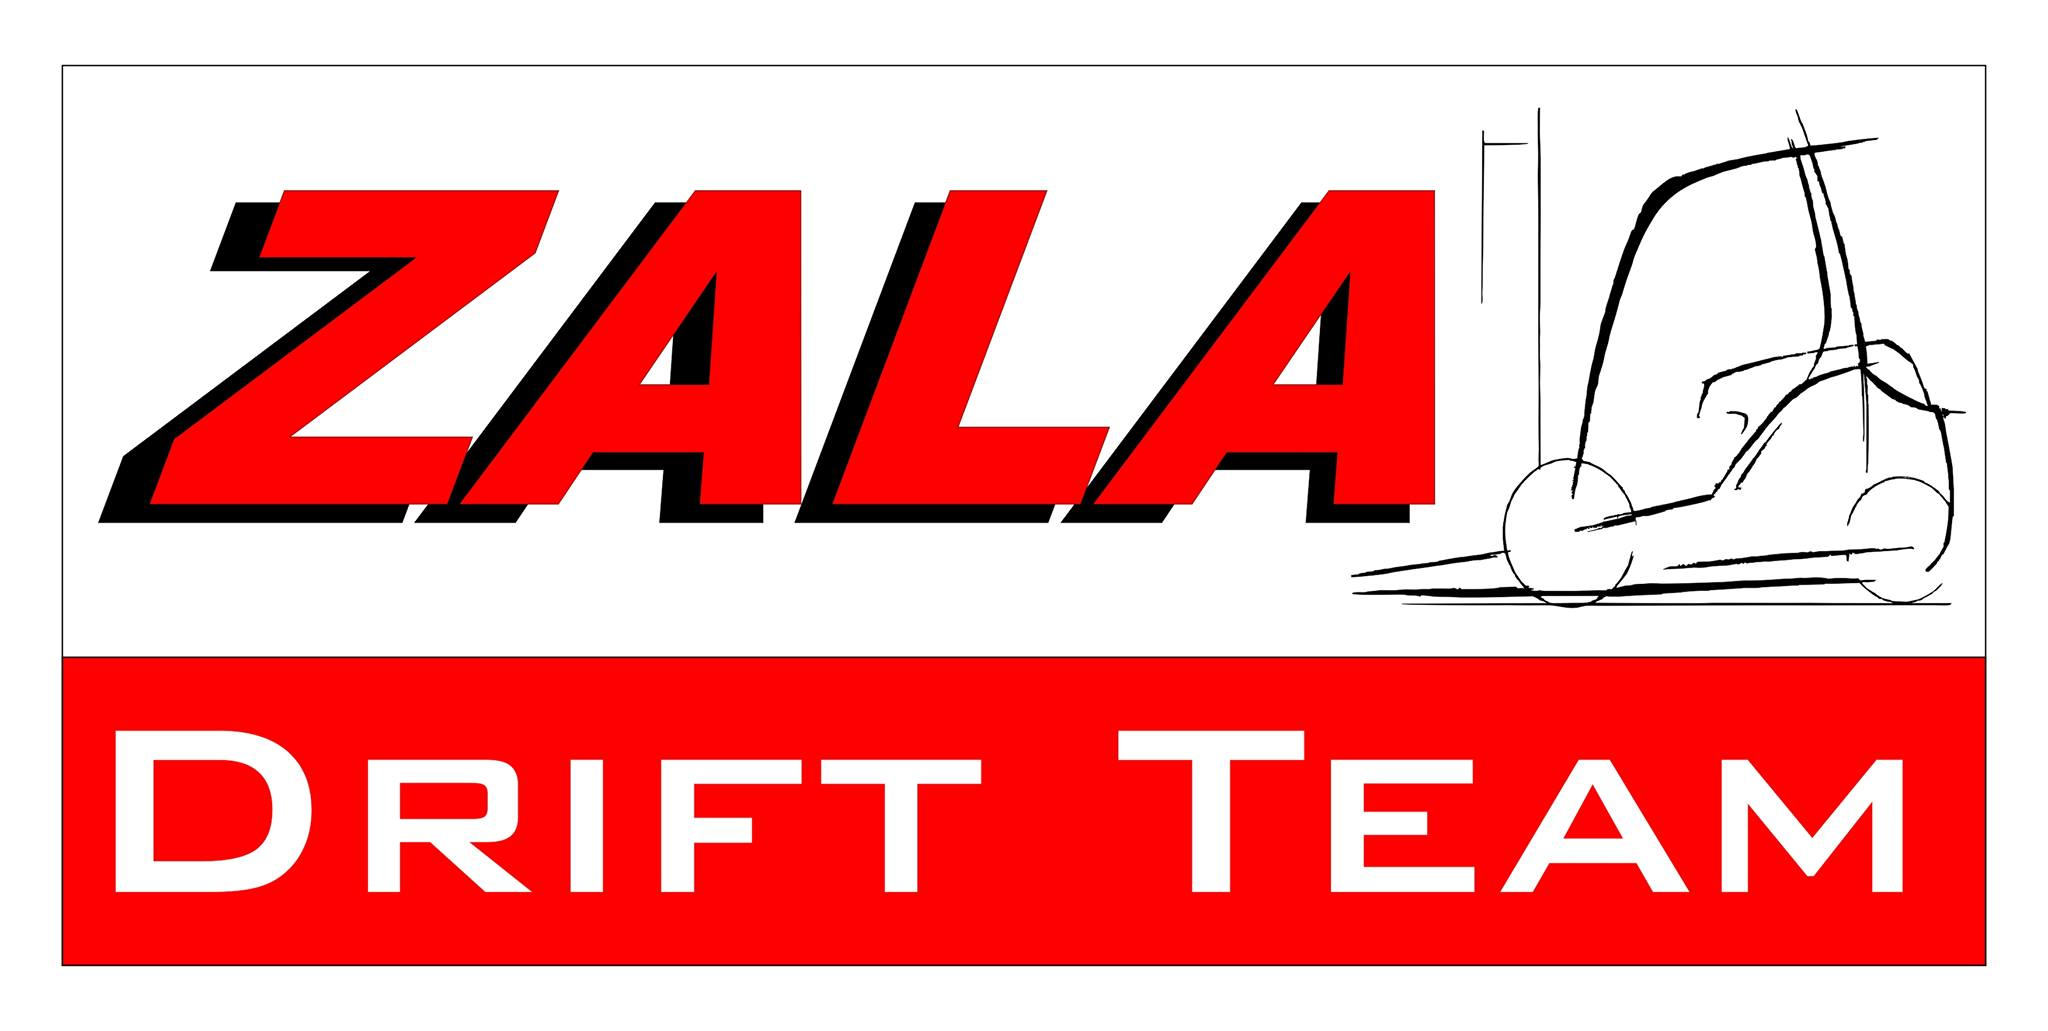 Nowy partner ZALA Drift Team na MOTO!